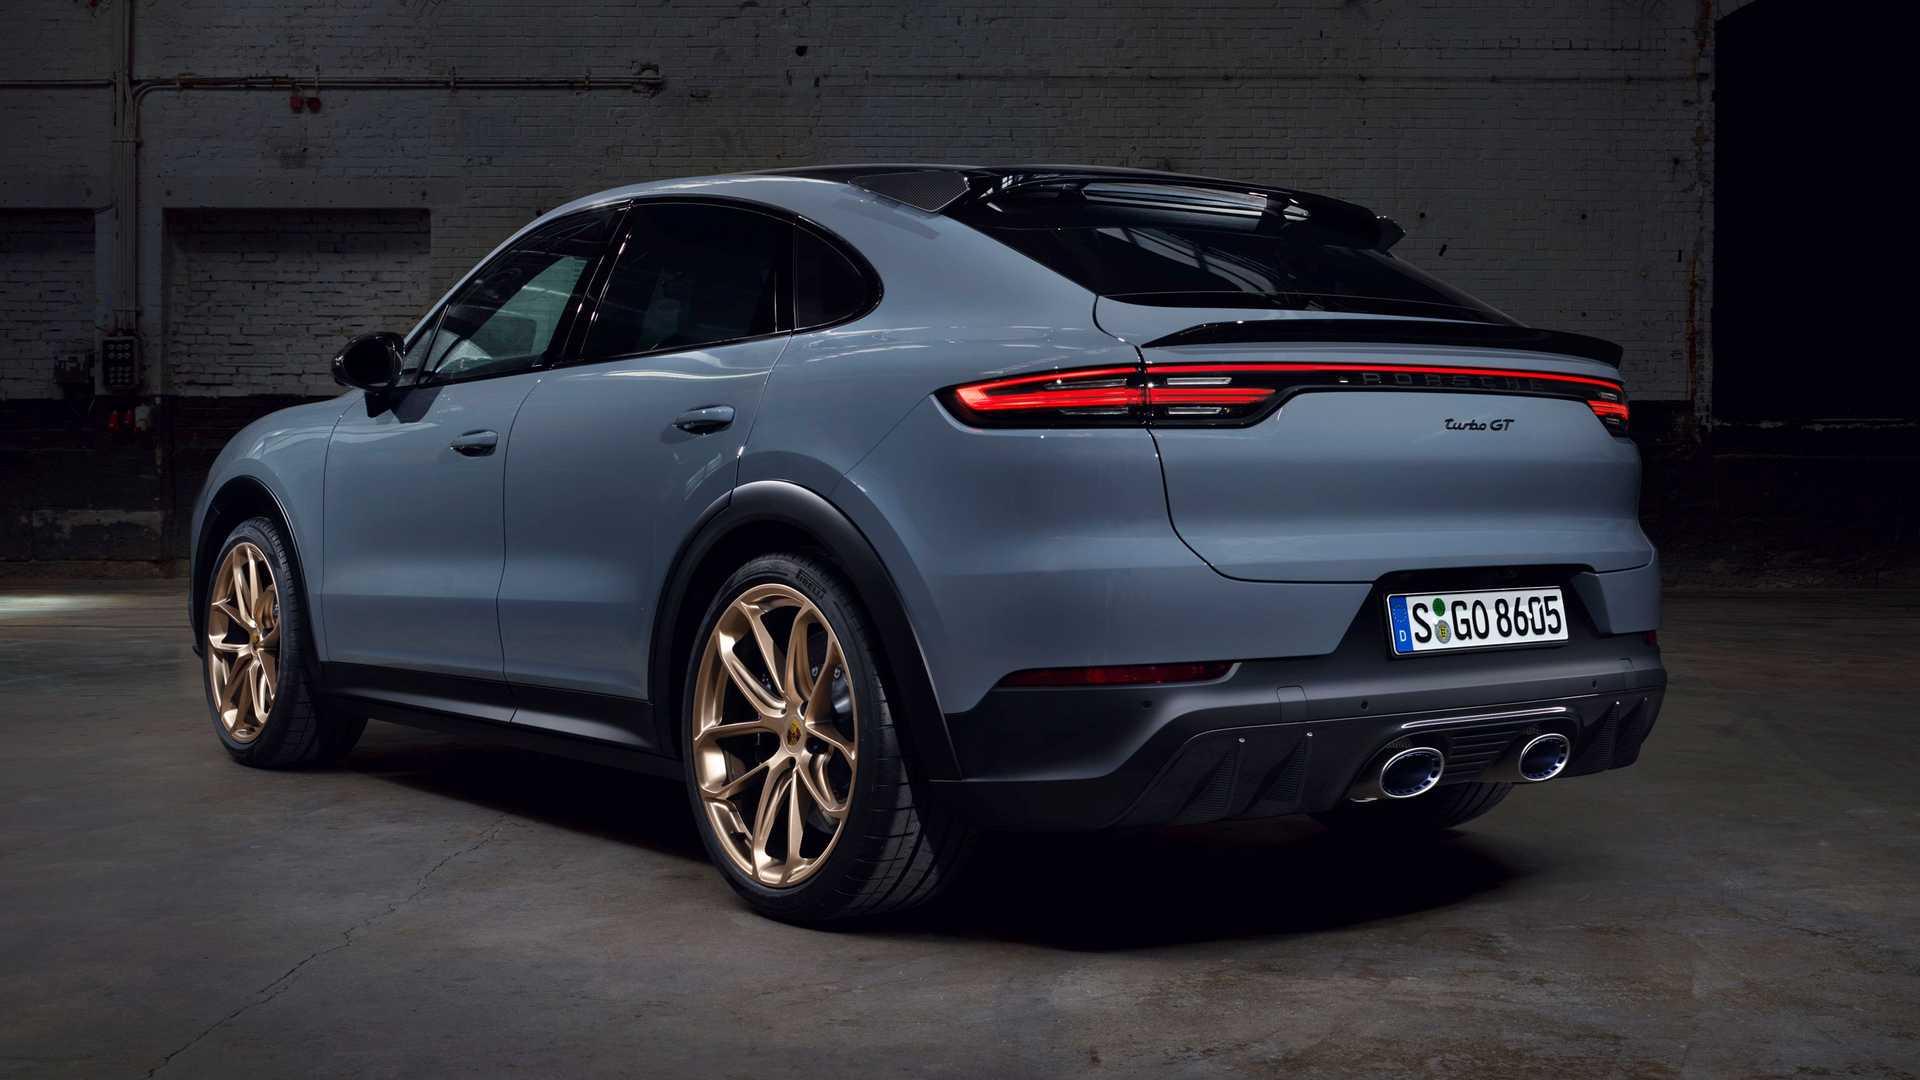 porsche-cayenne-turbo-gt-rear.jpeg